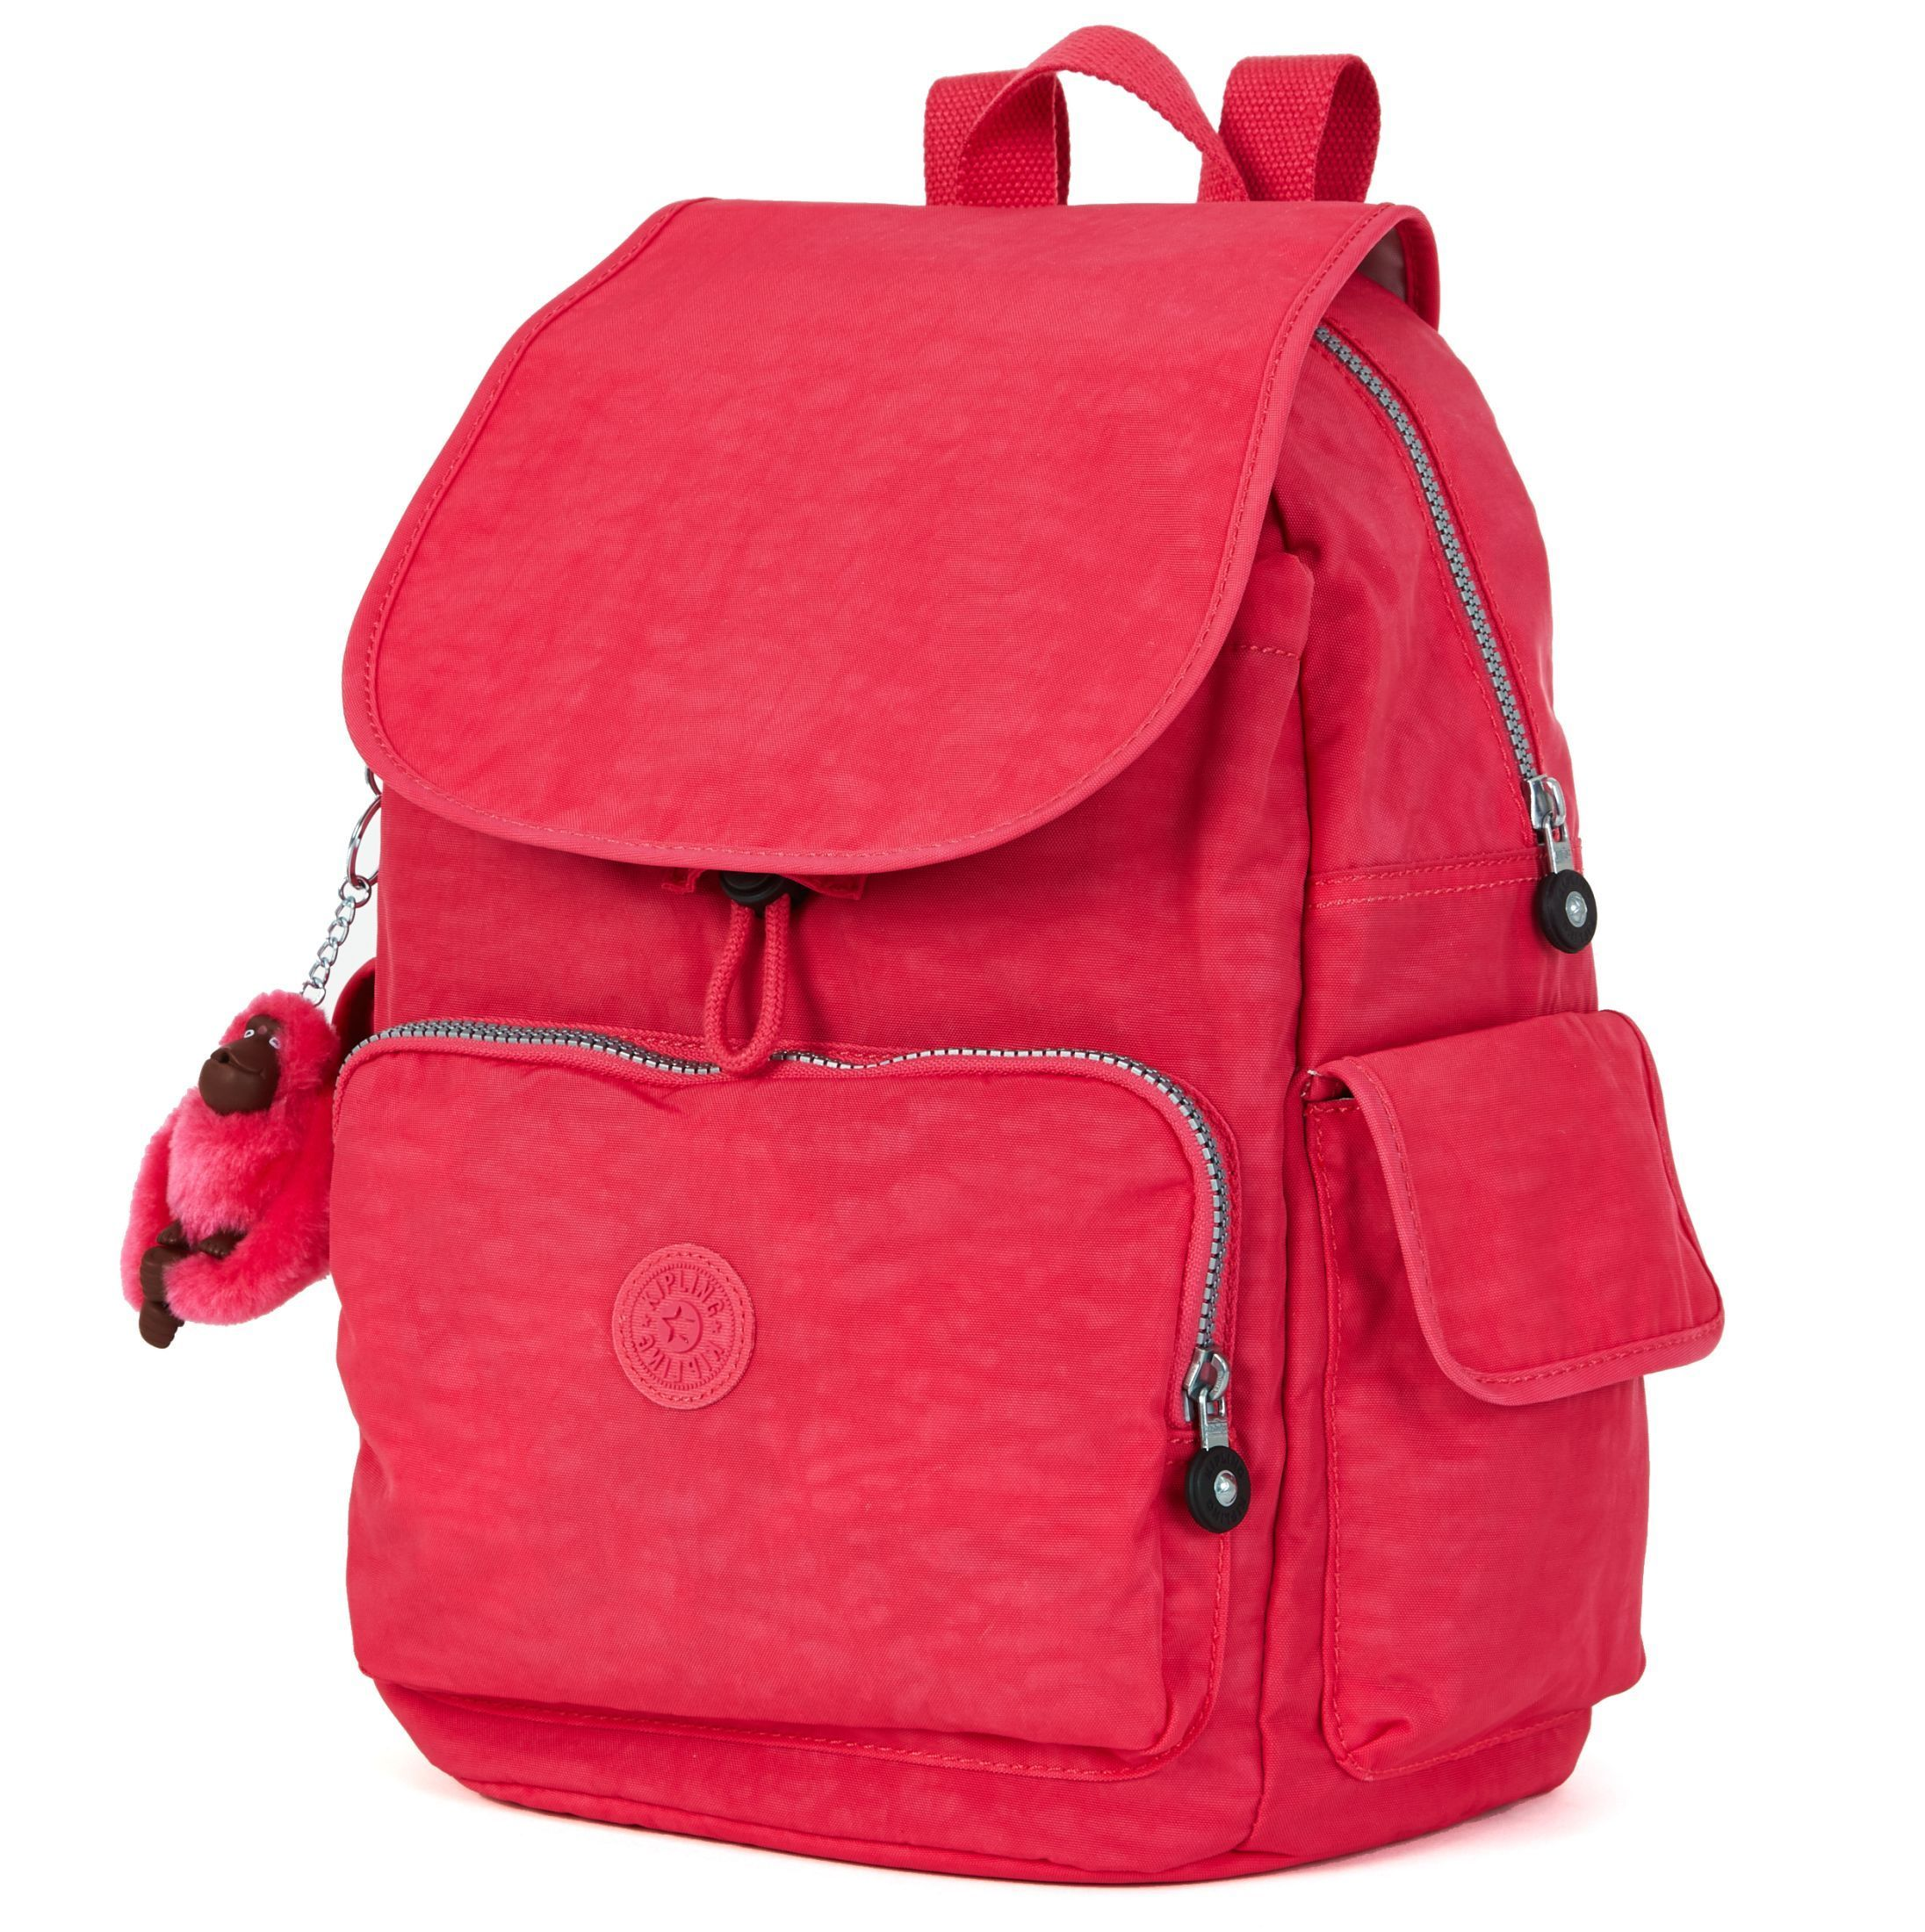 782443ca2 Ravier Backpack - Vibrant Pink   Kipling   Bags em 2019   Kipling ...